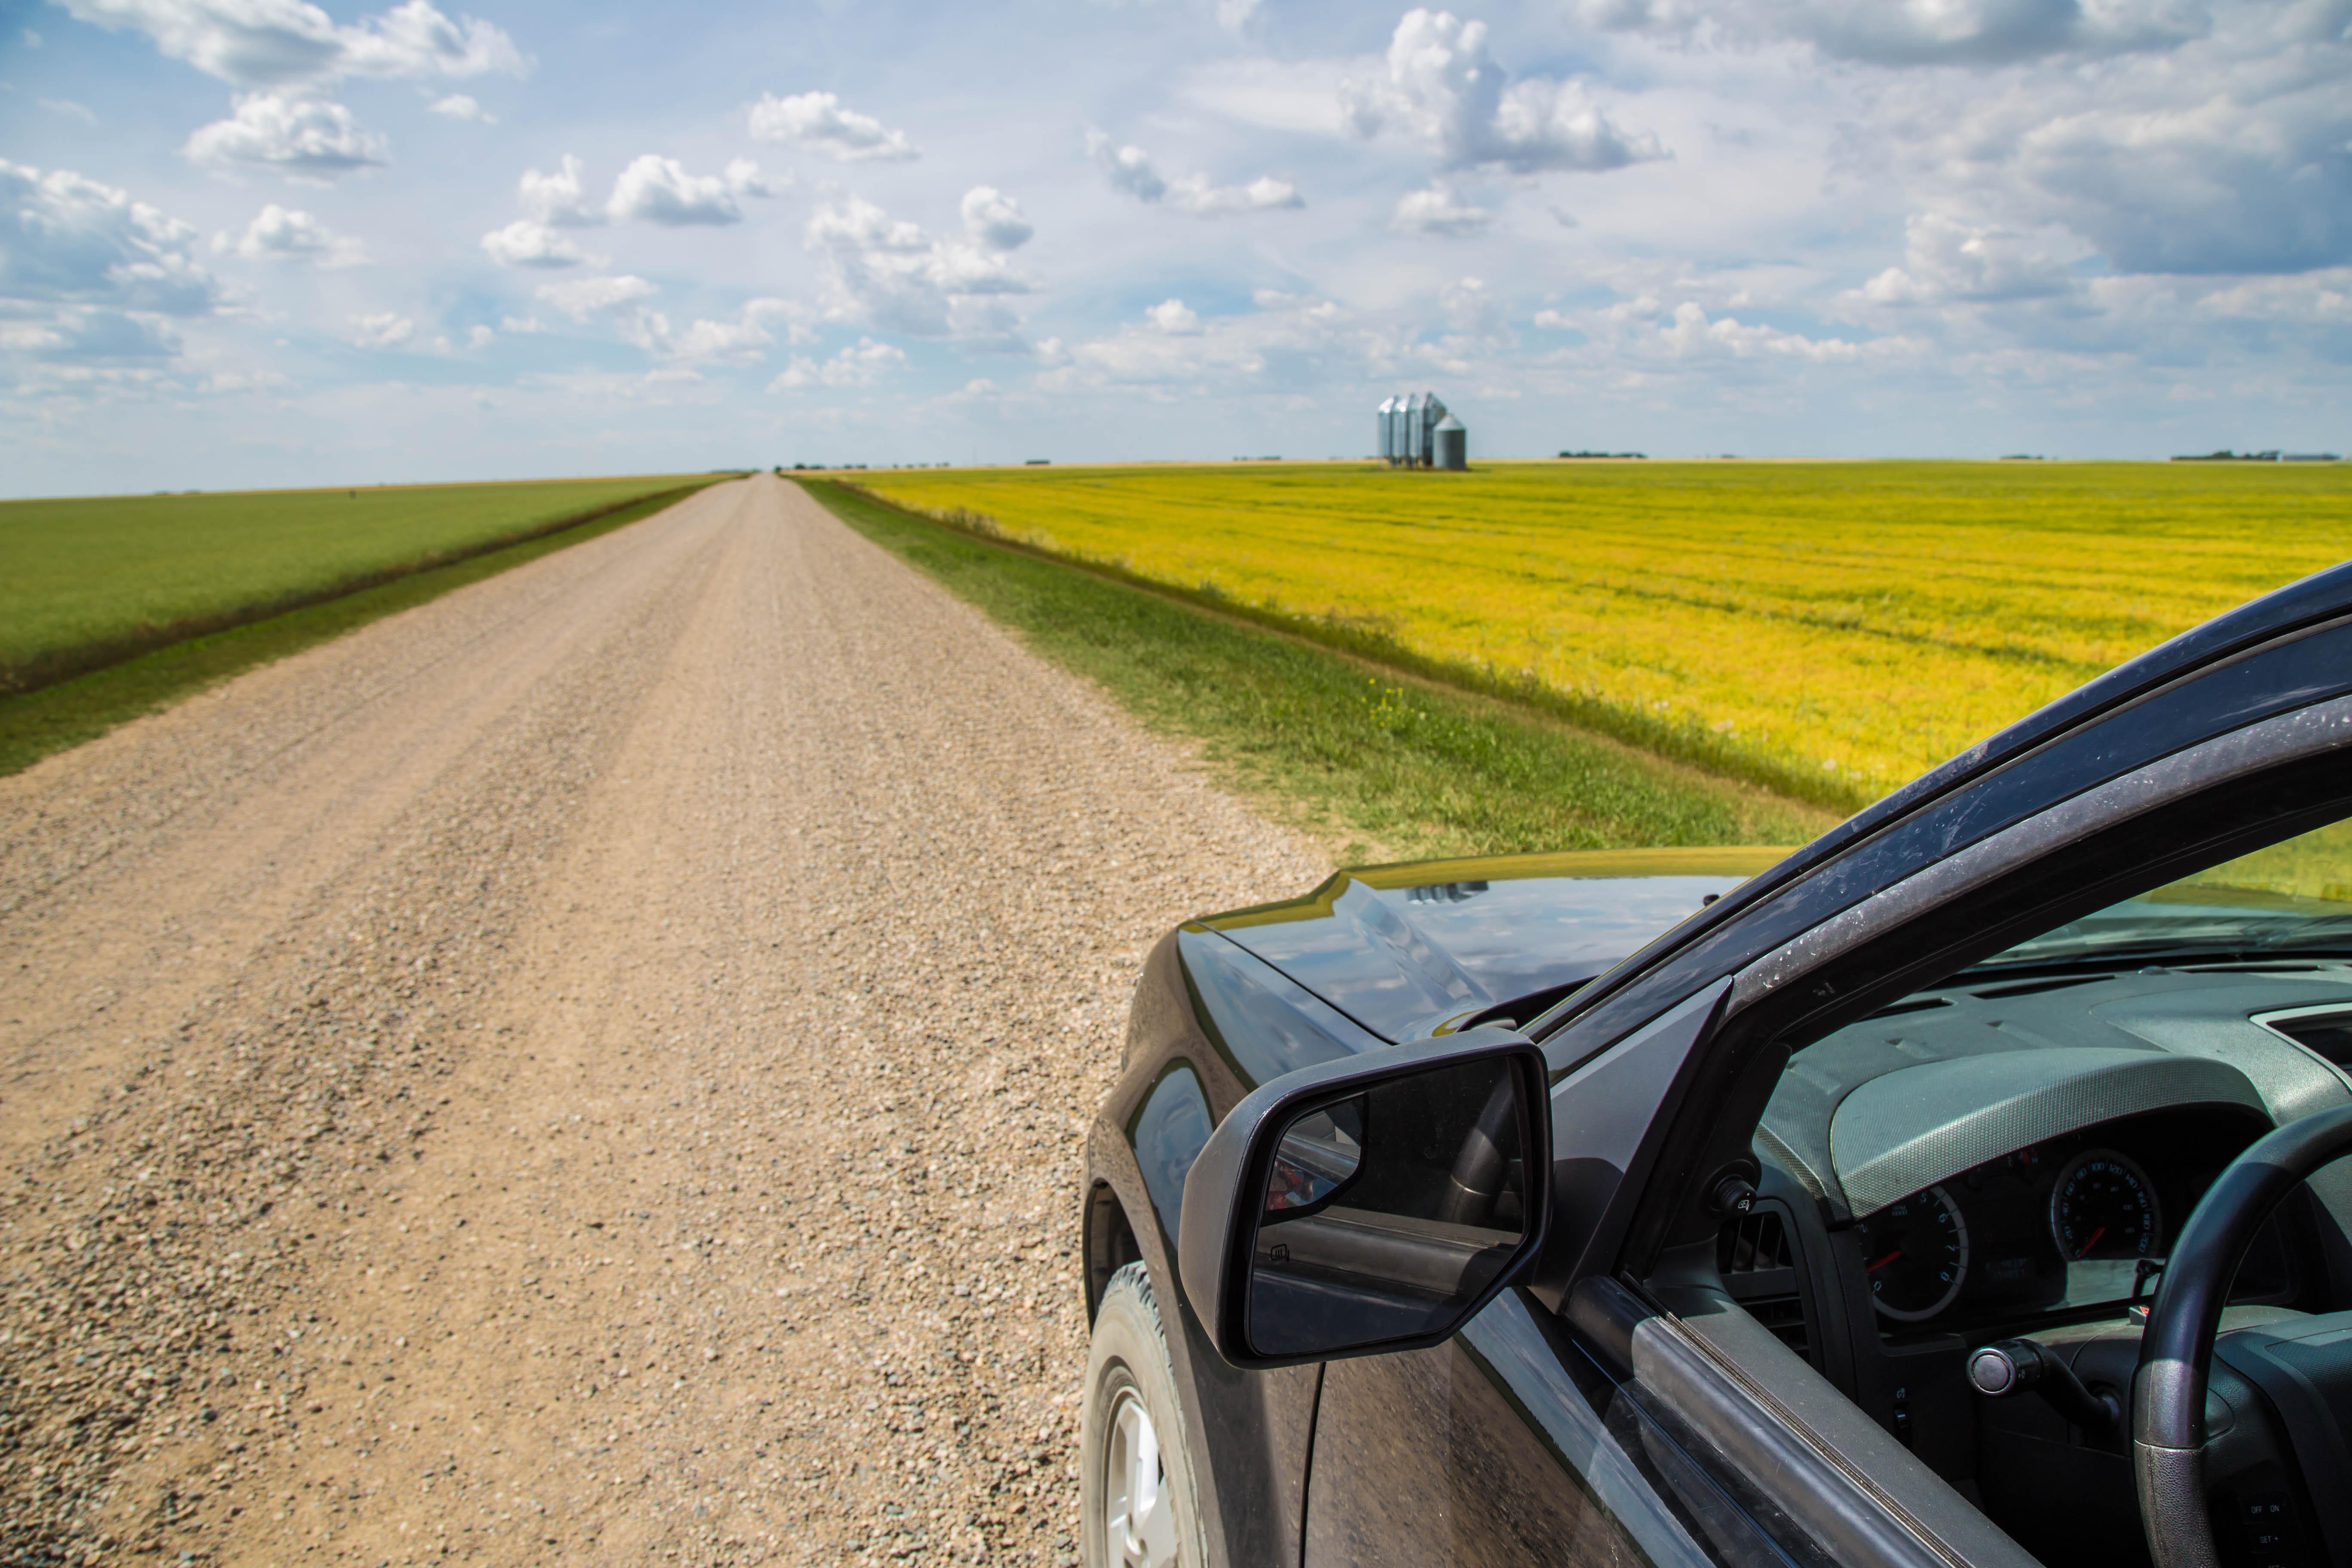 Road Trip Ideas for Your Next Saskatchewan Getaway